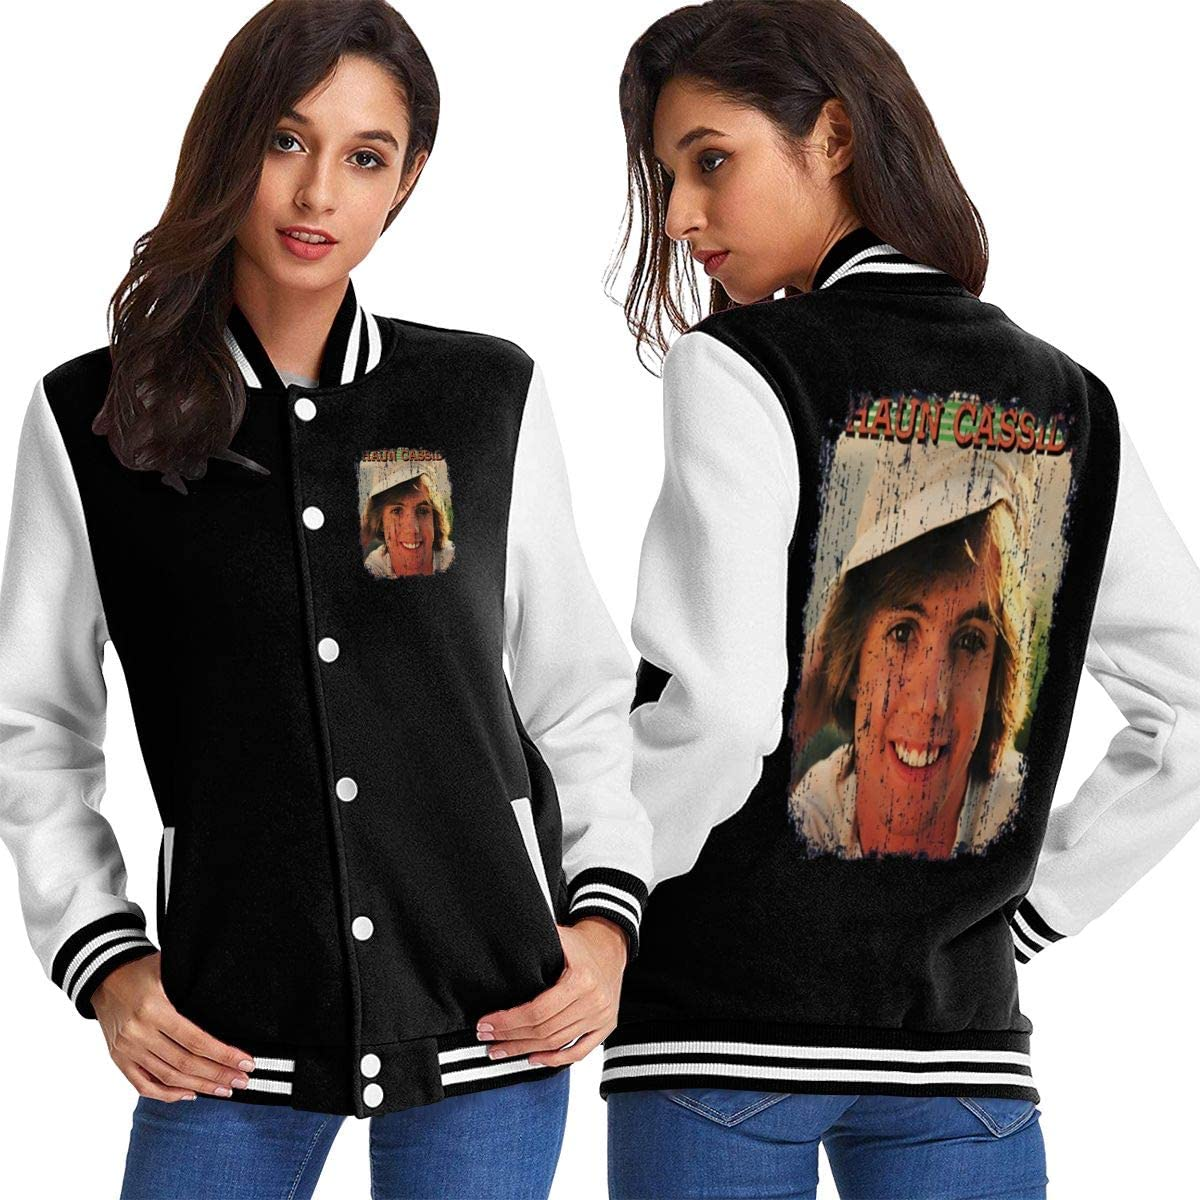 Shaun Cassidy 70s Celebrity Heartthrobe Vintage Worn Look Womens Sport Baseball Uniform Jacket Coat Adult Coat